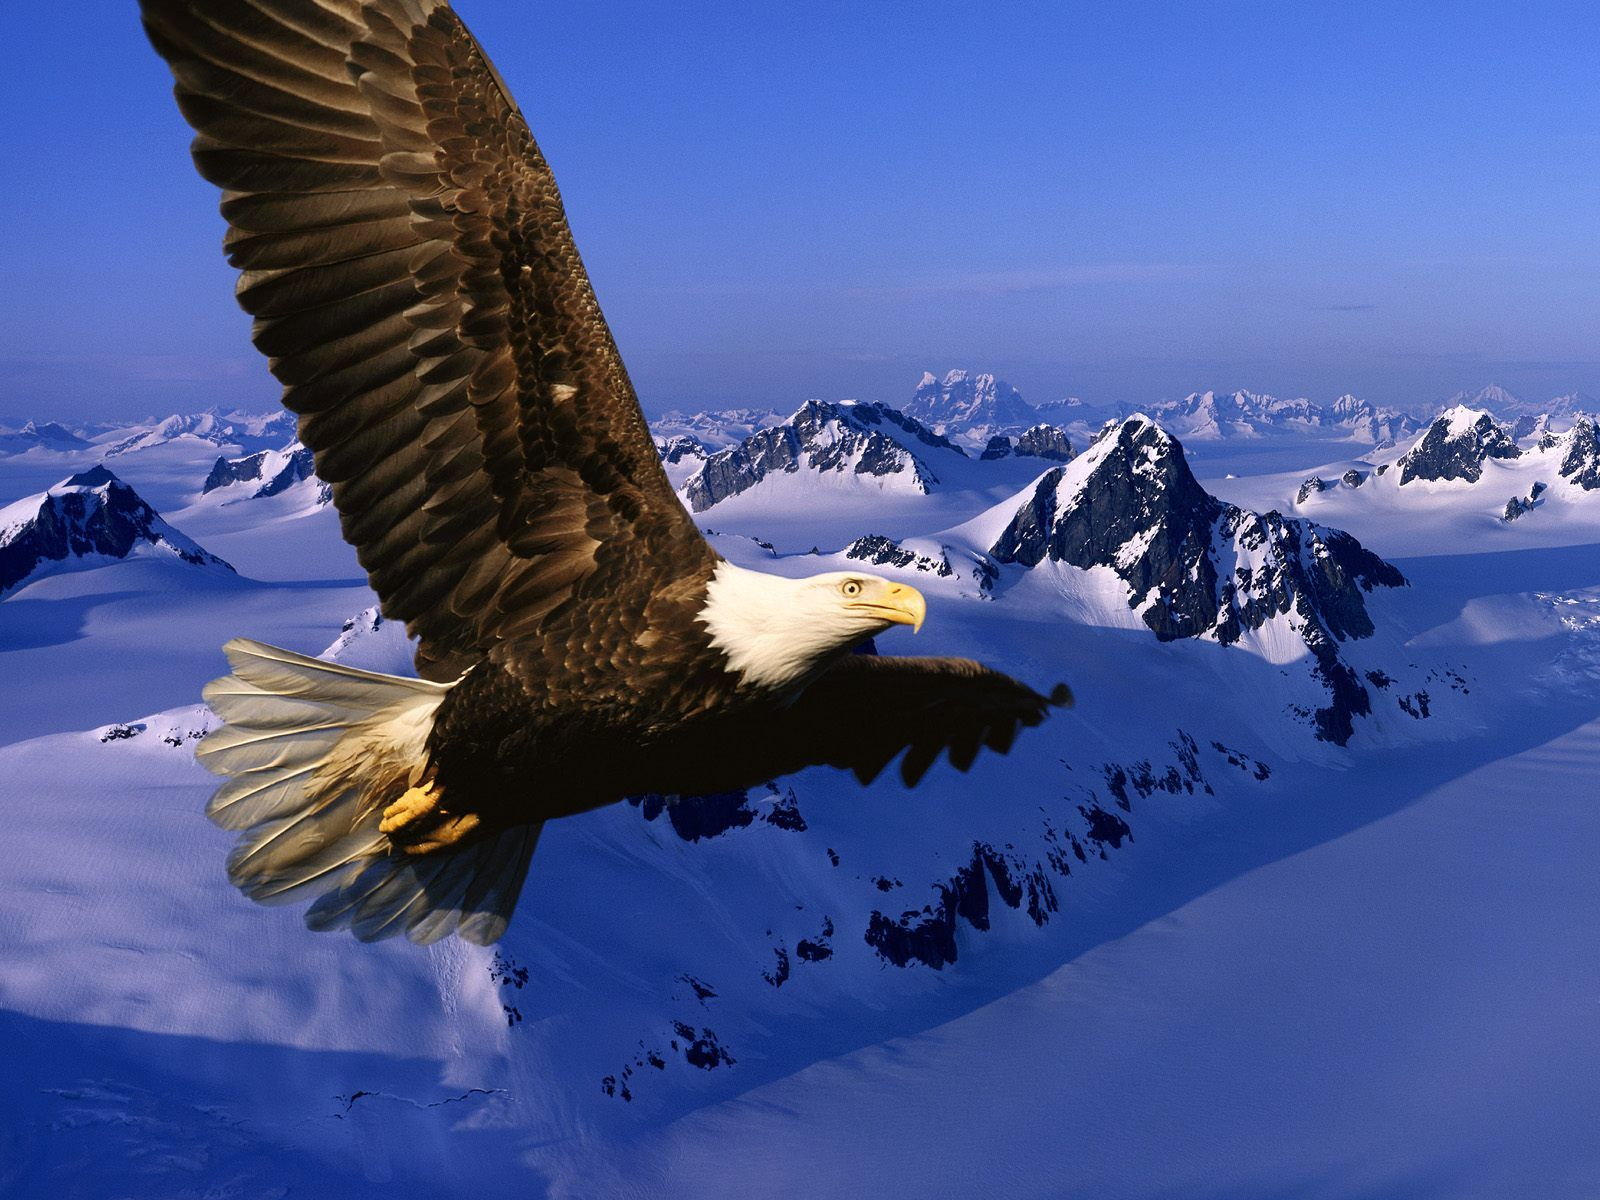 Eagle Wallpapers Bird Eagle Wallpapers Patriotic Bald Eagle 1600x1200